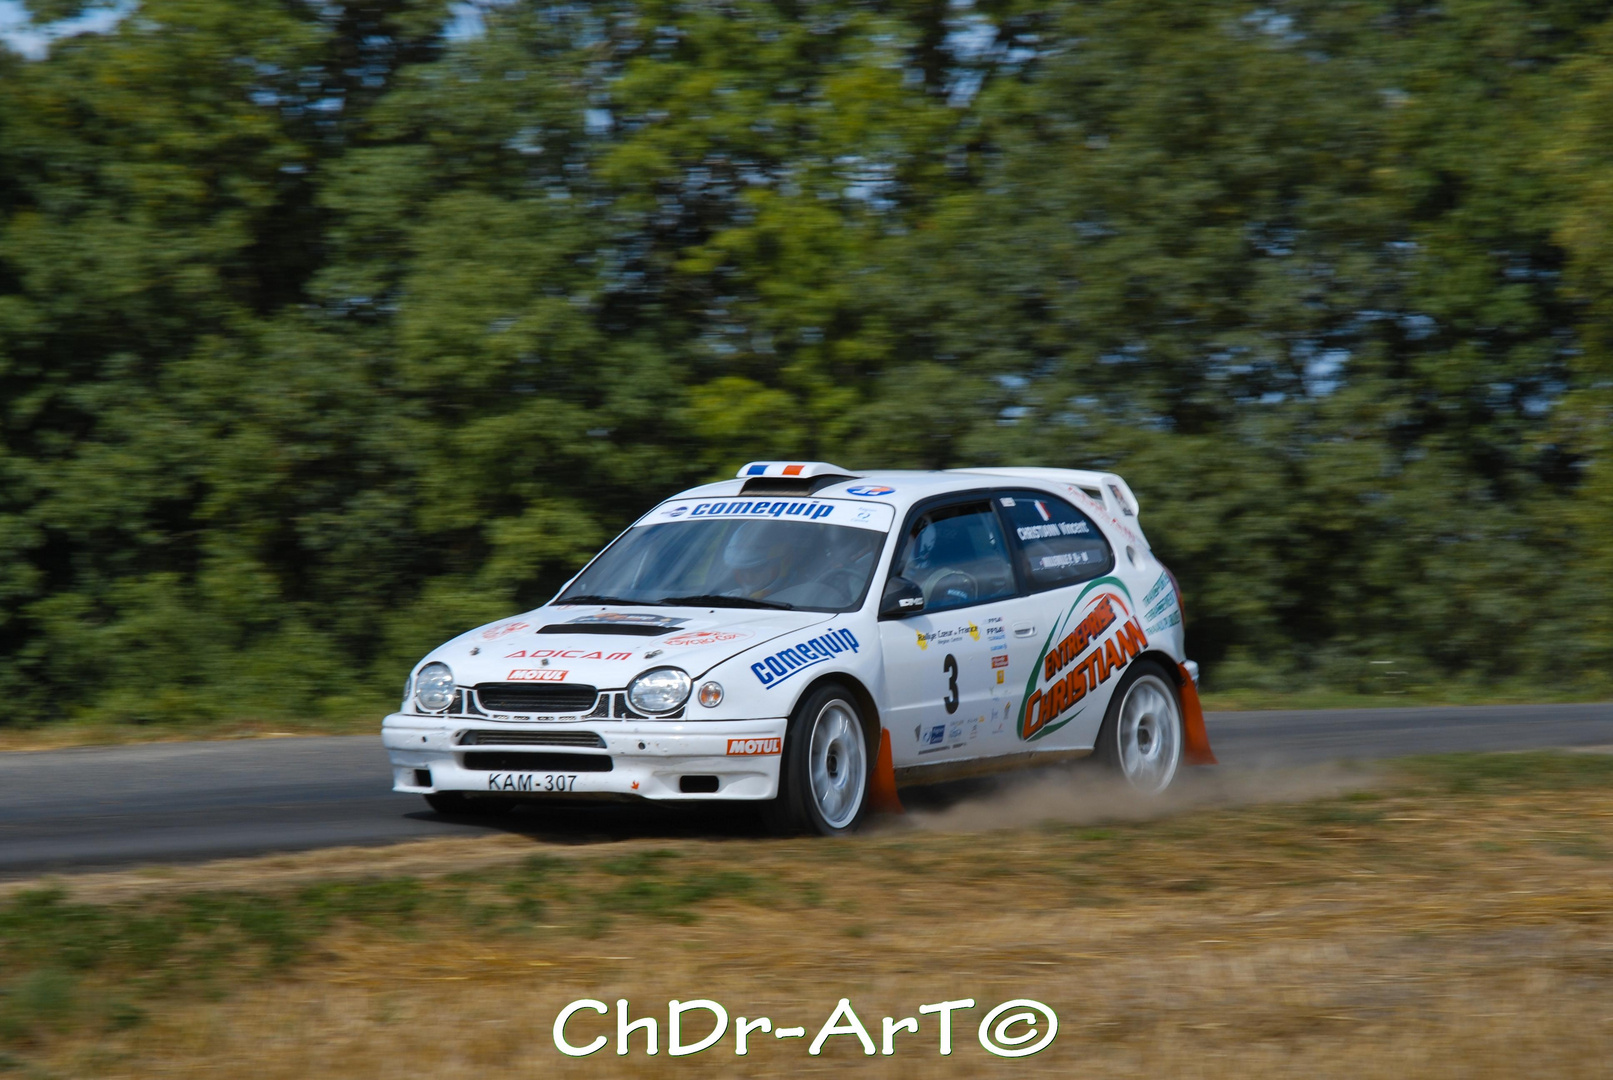 Rallye coeur de france 2010